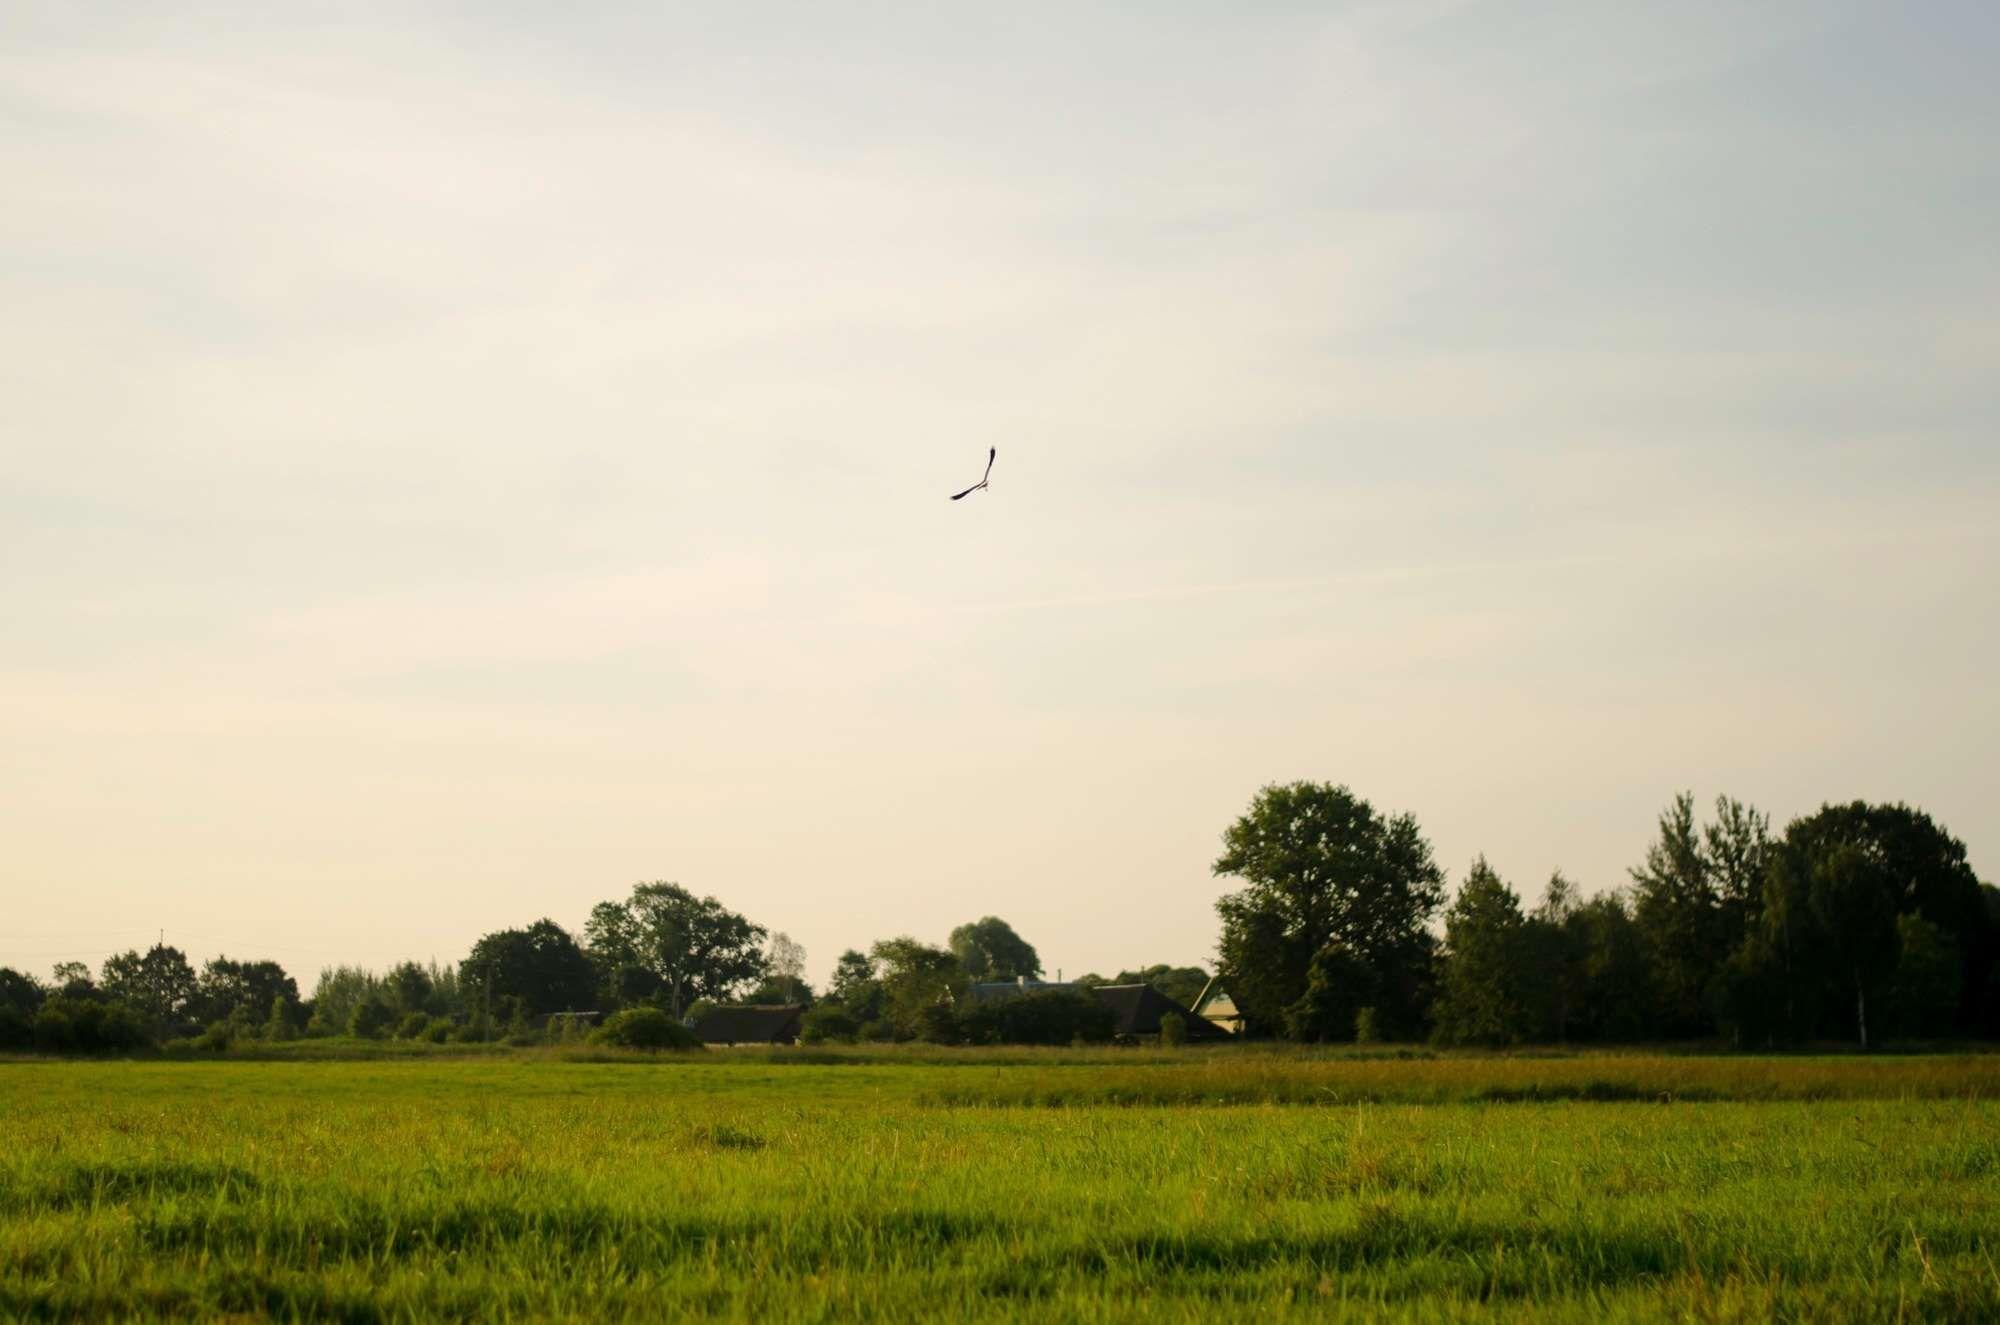 #agriculture #bird #countryside #environment #farm #farmland #field #grass #grassland #meadow #outdoor #rural #sky